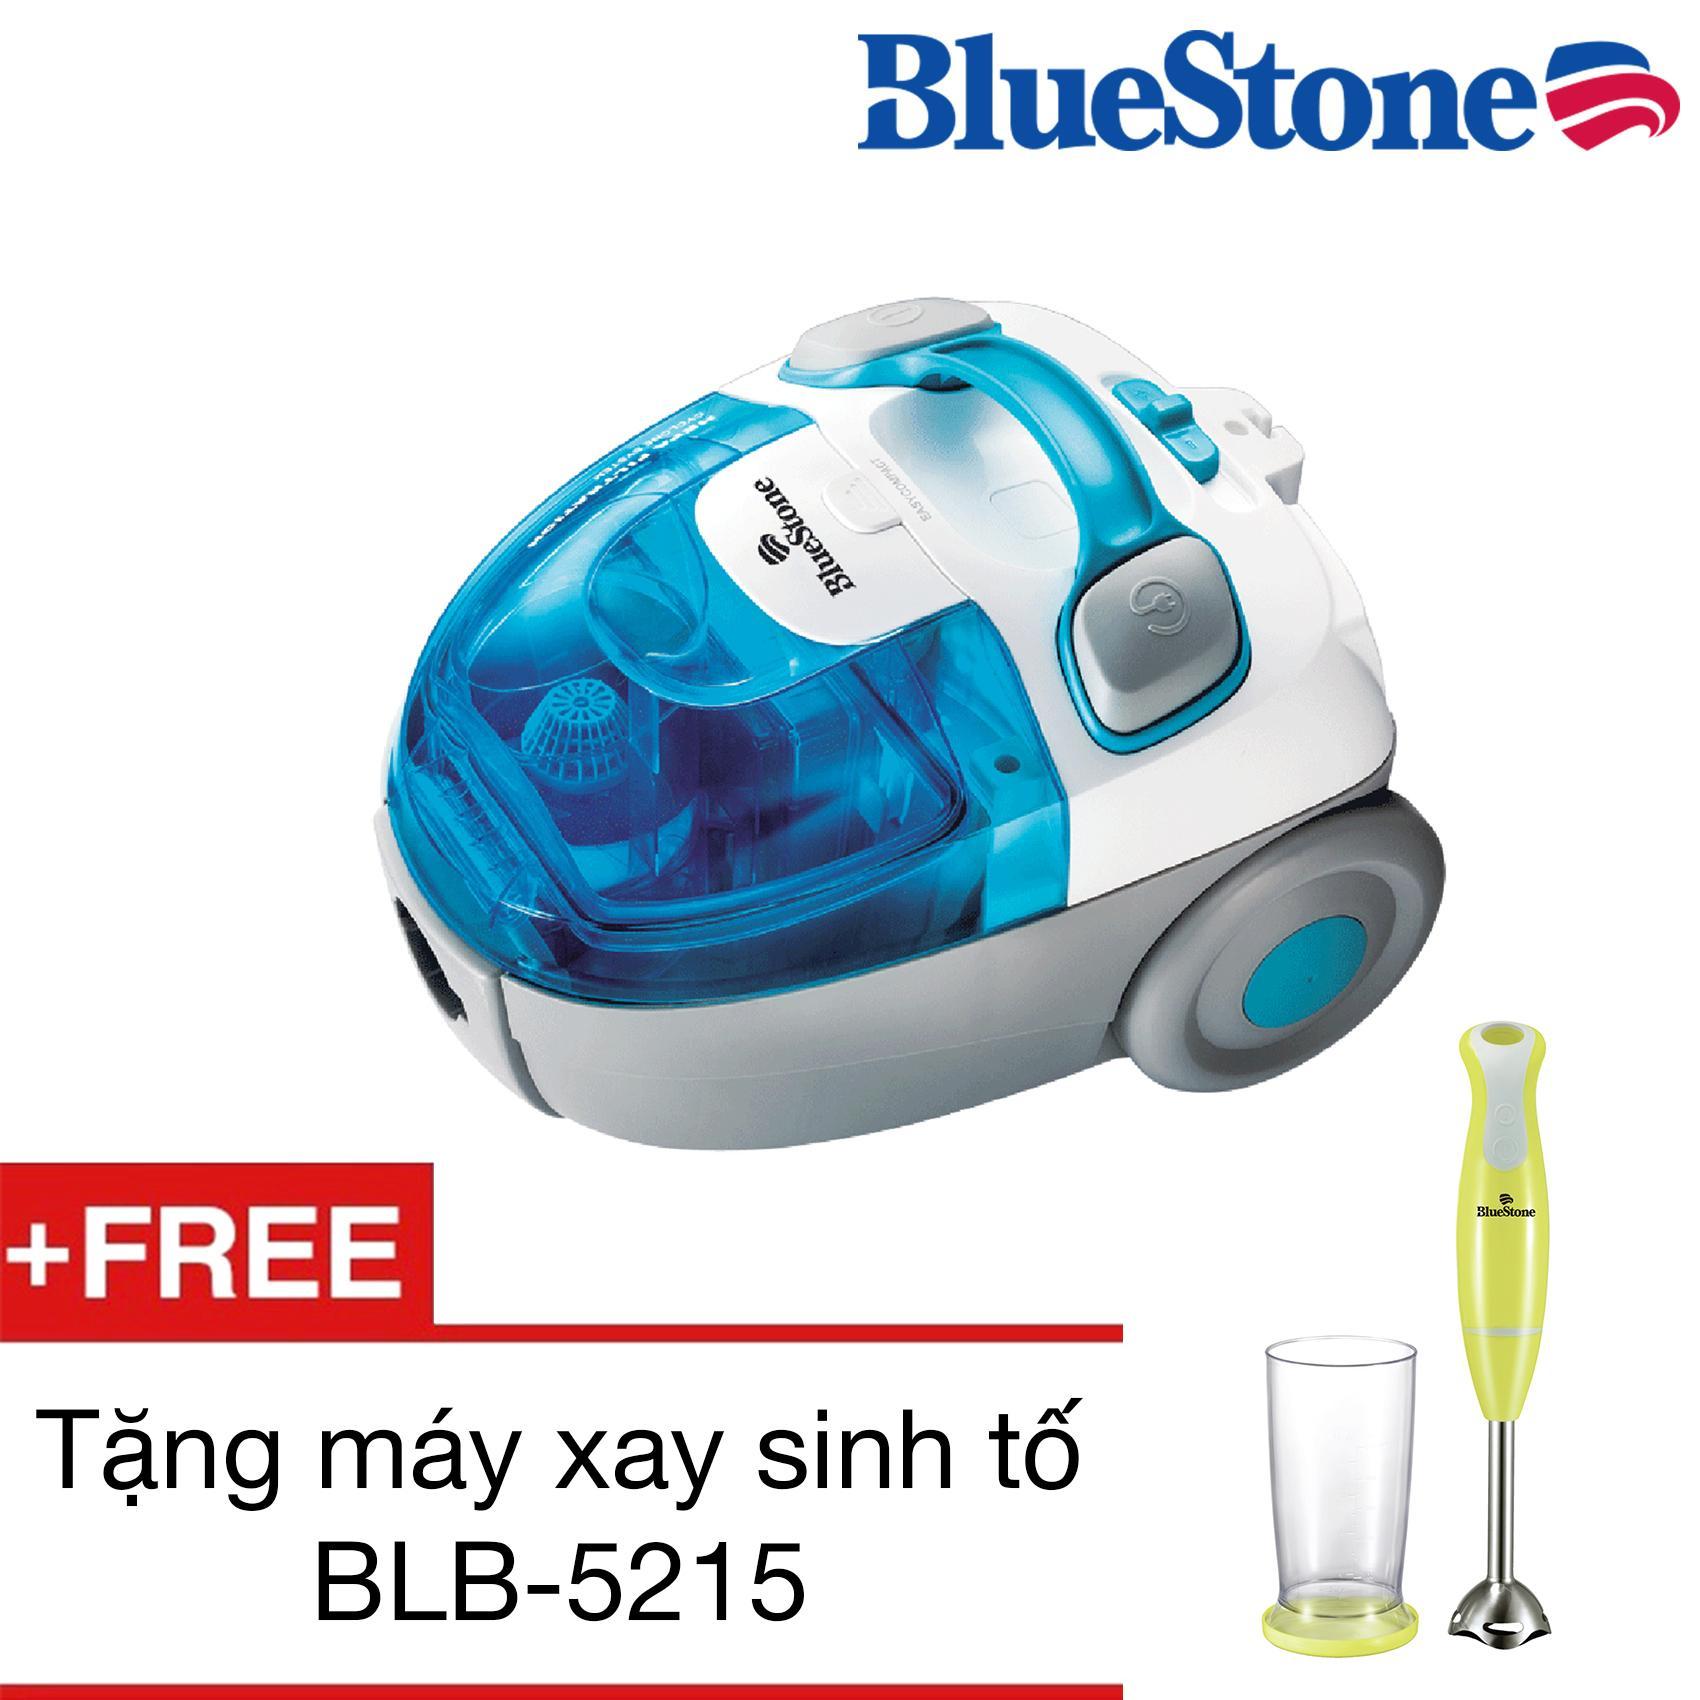 Máy hút bụi BlueStone VCB-8037 TẶNG Máy xay sinh tố BLB-5215